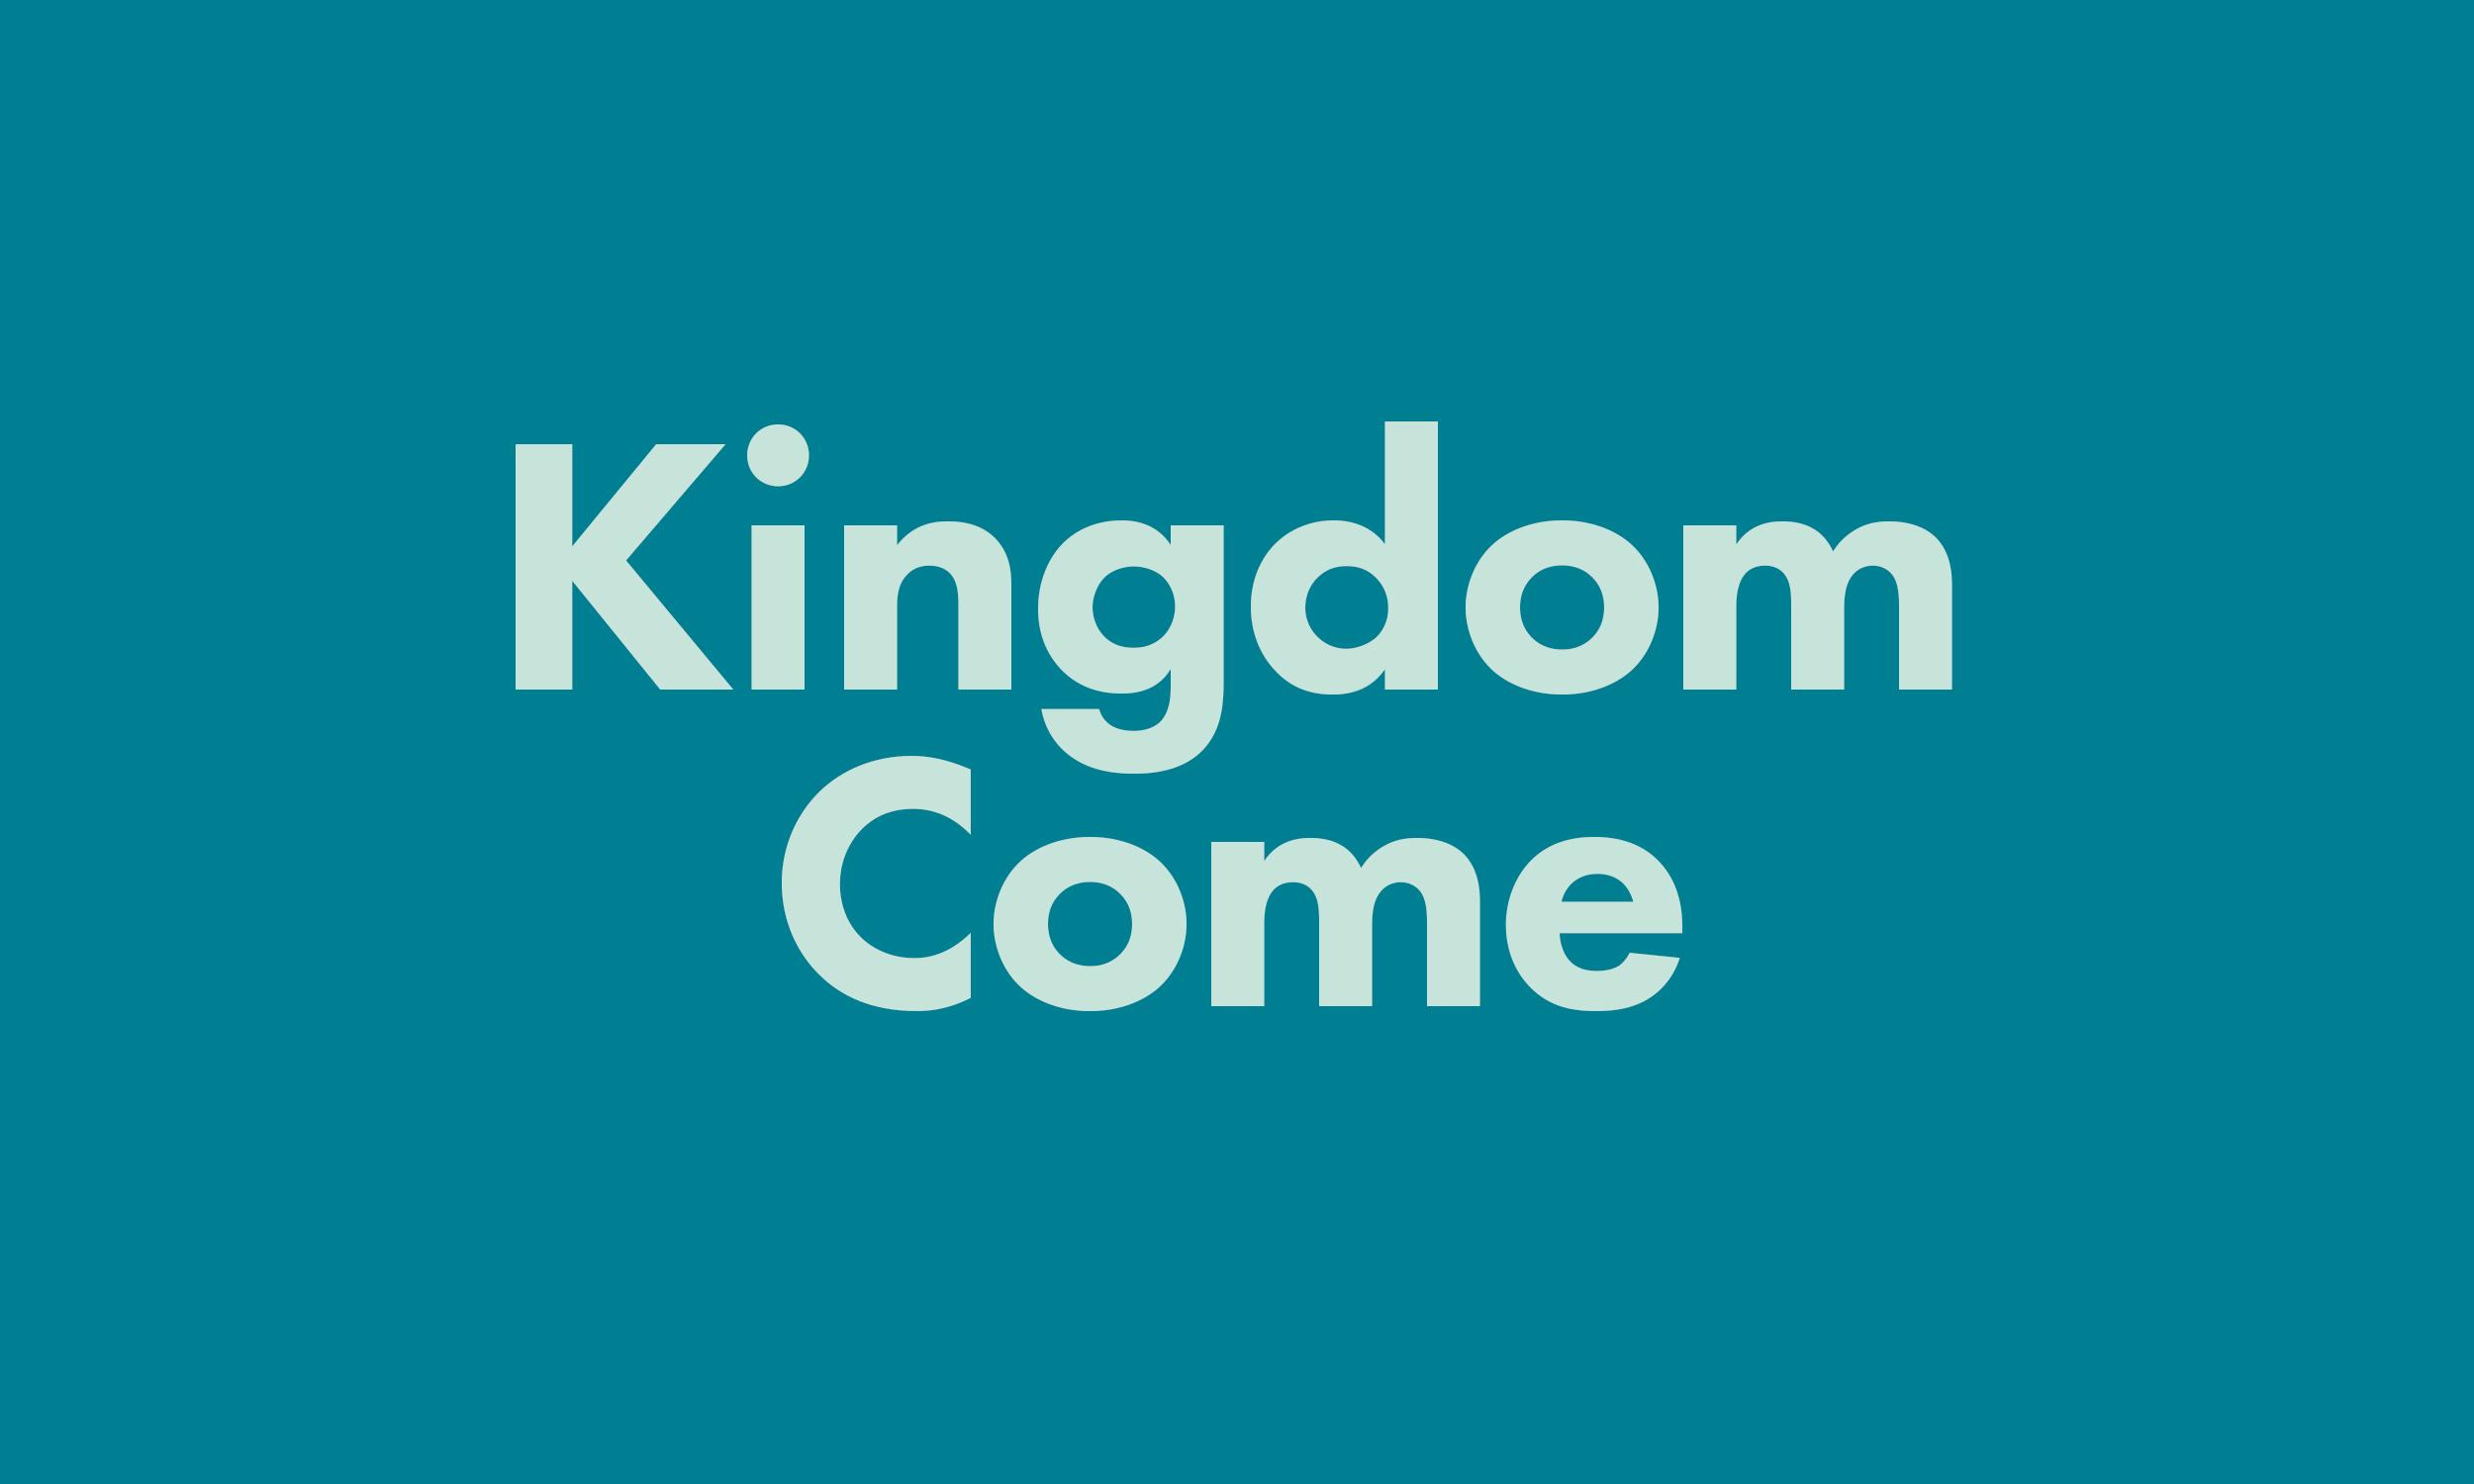 whats-on-kingdom-come.jpg